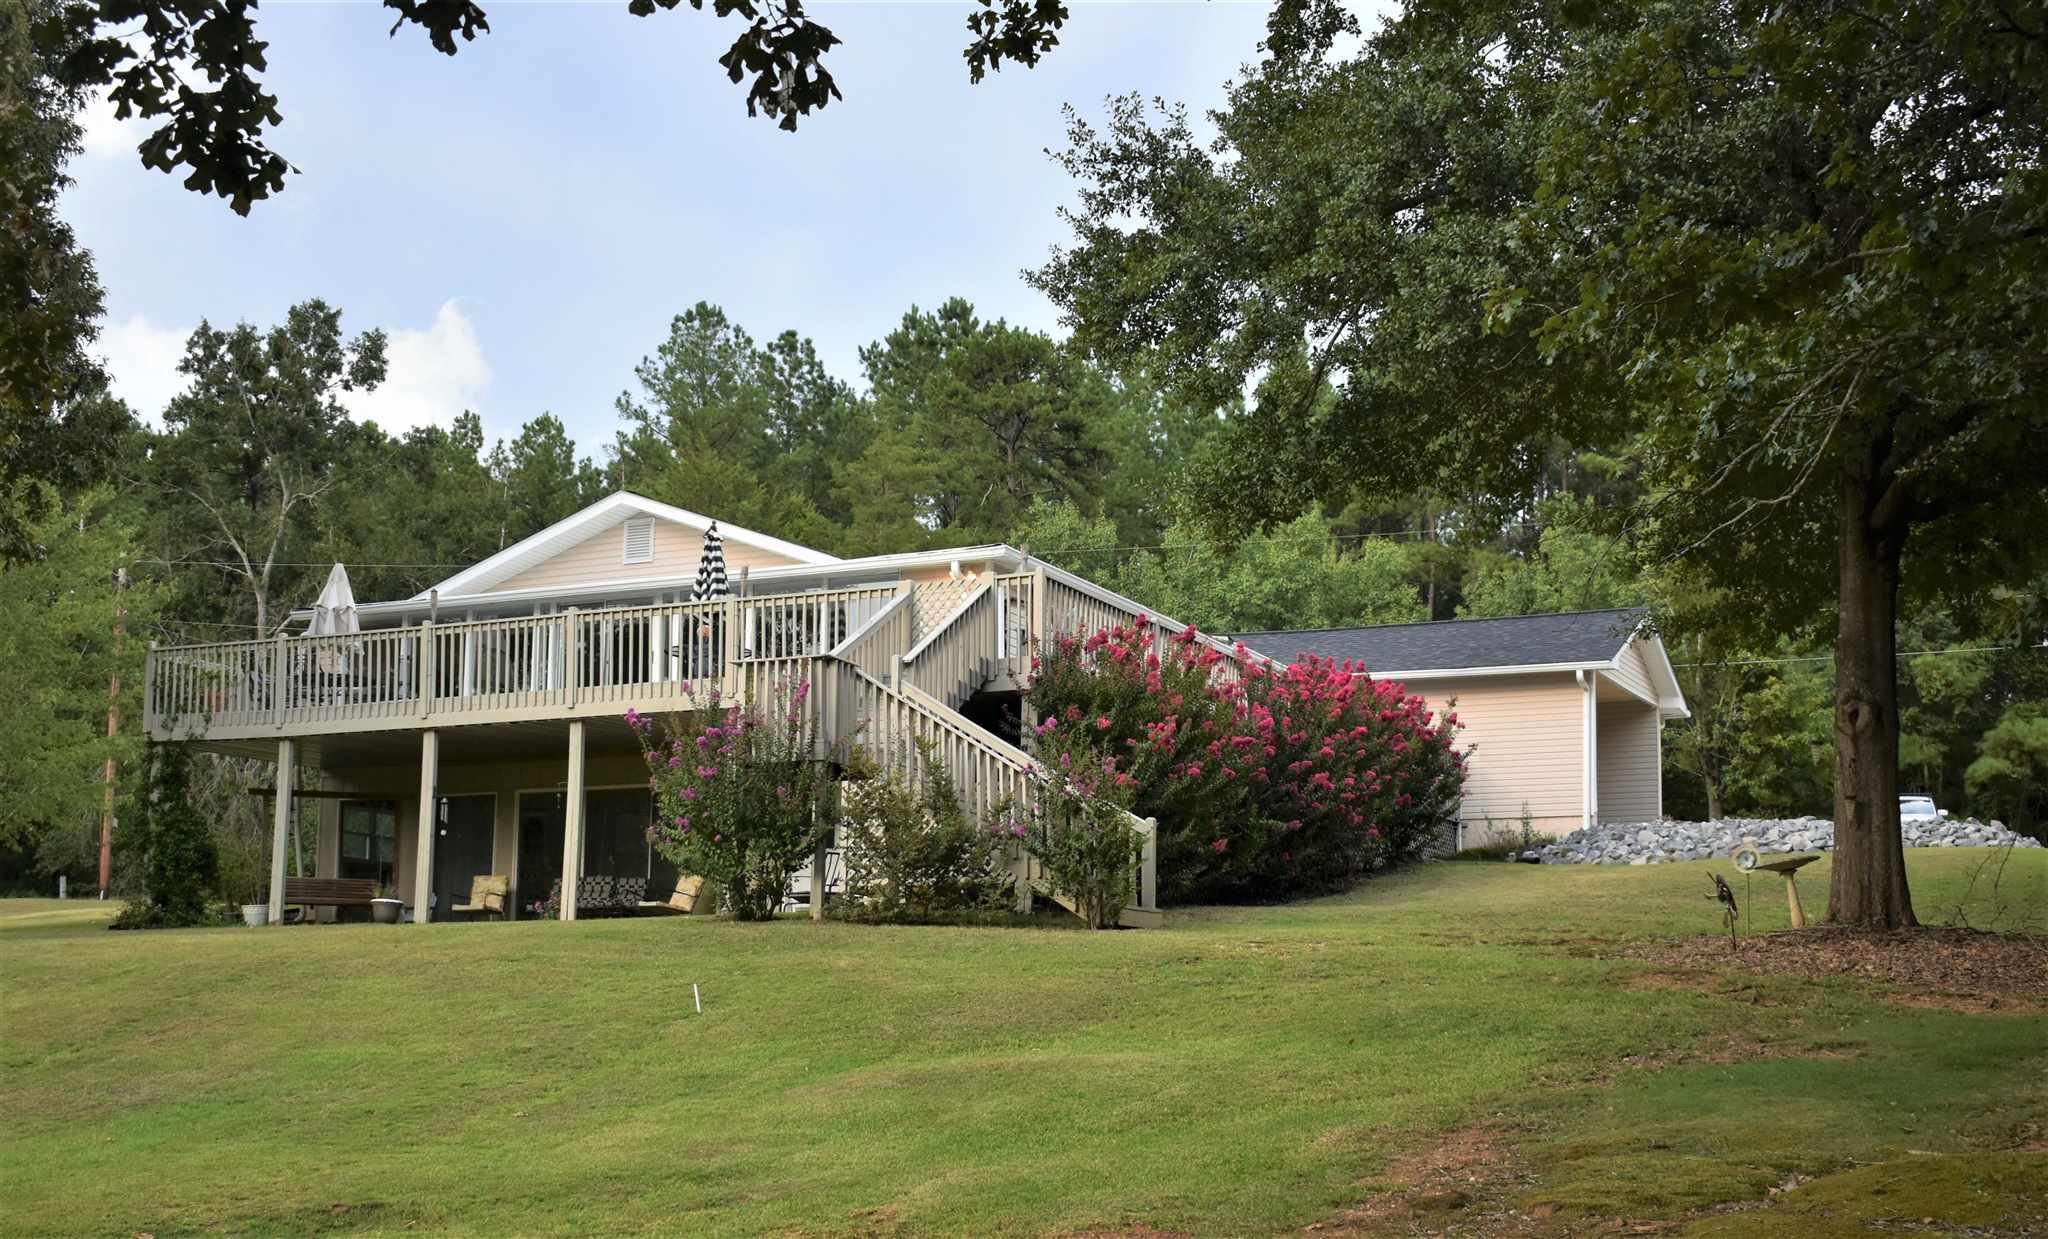 162 TWISTING HILL ROAD, Lake Sinclair, Georgia